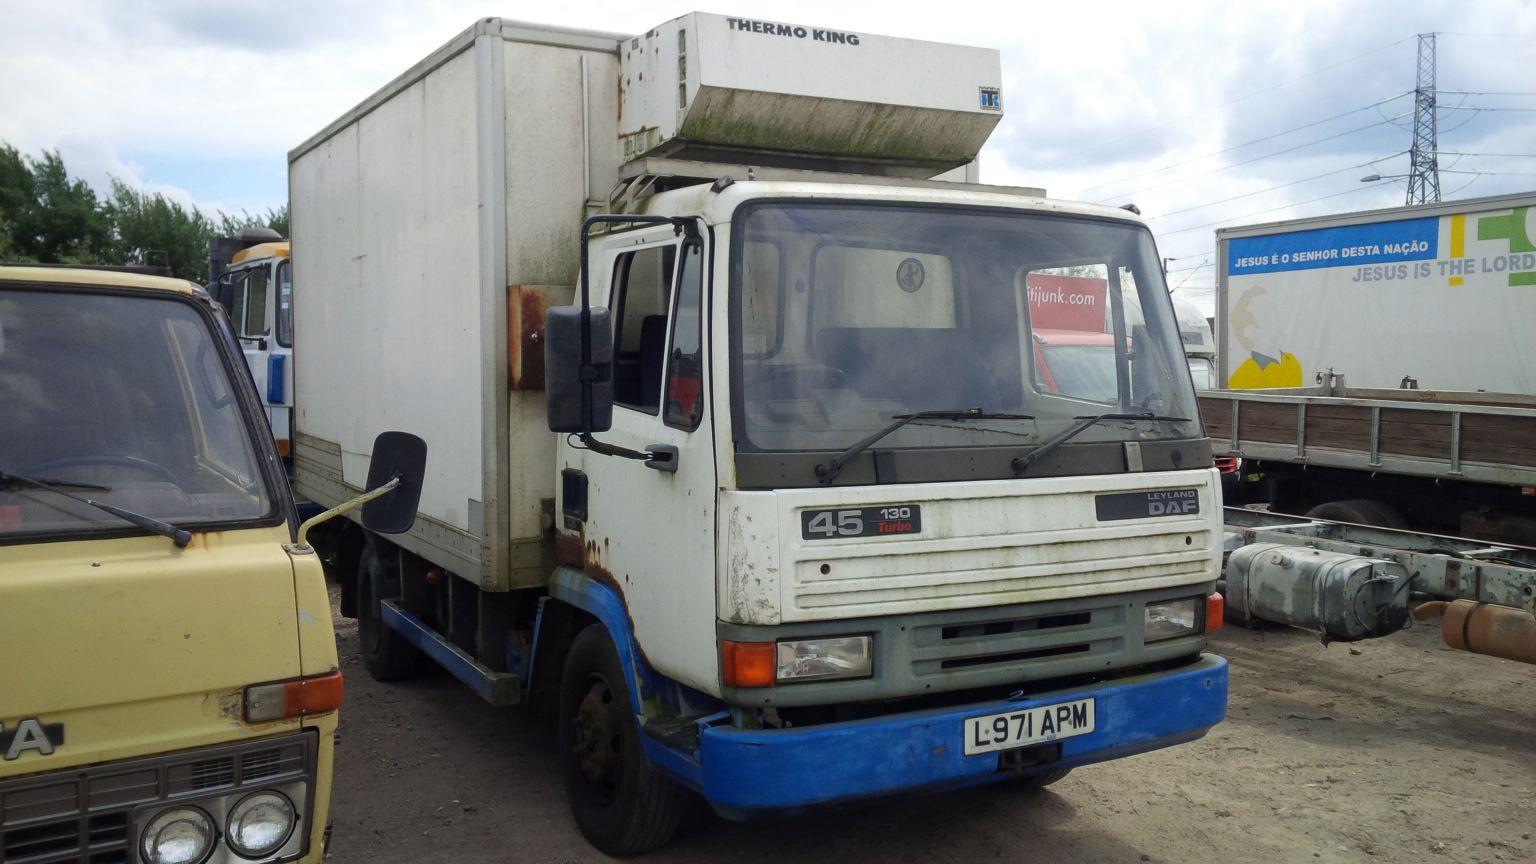 DAF 45 fridge box lorry.